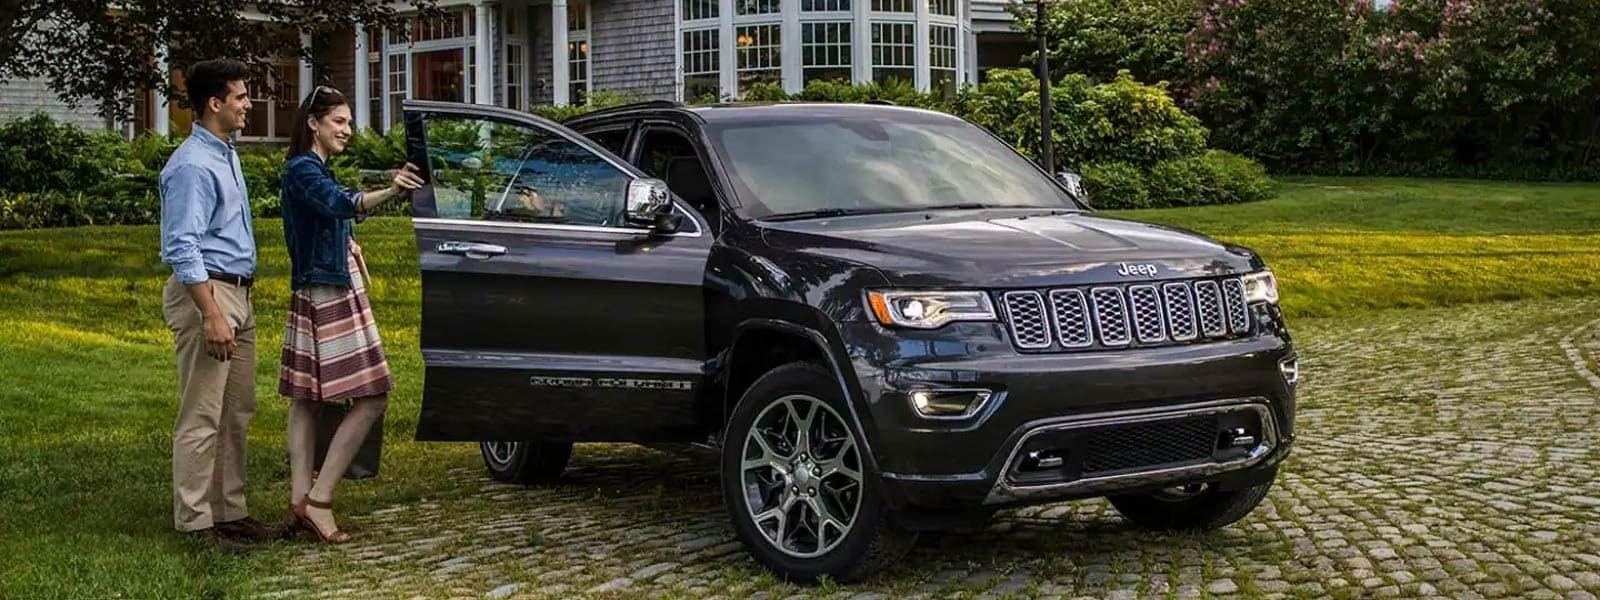 Finance or Lease new 2021 Jeep Grand Cherokee in Rosetown Saskatchewan